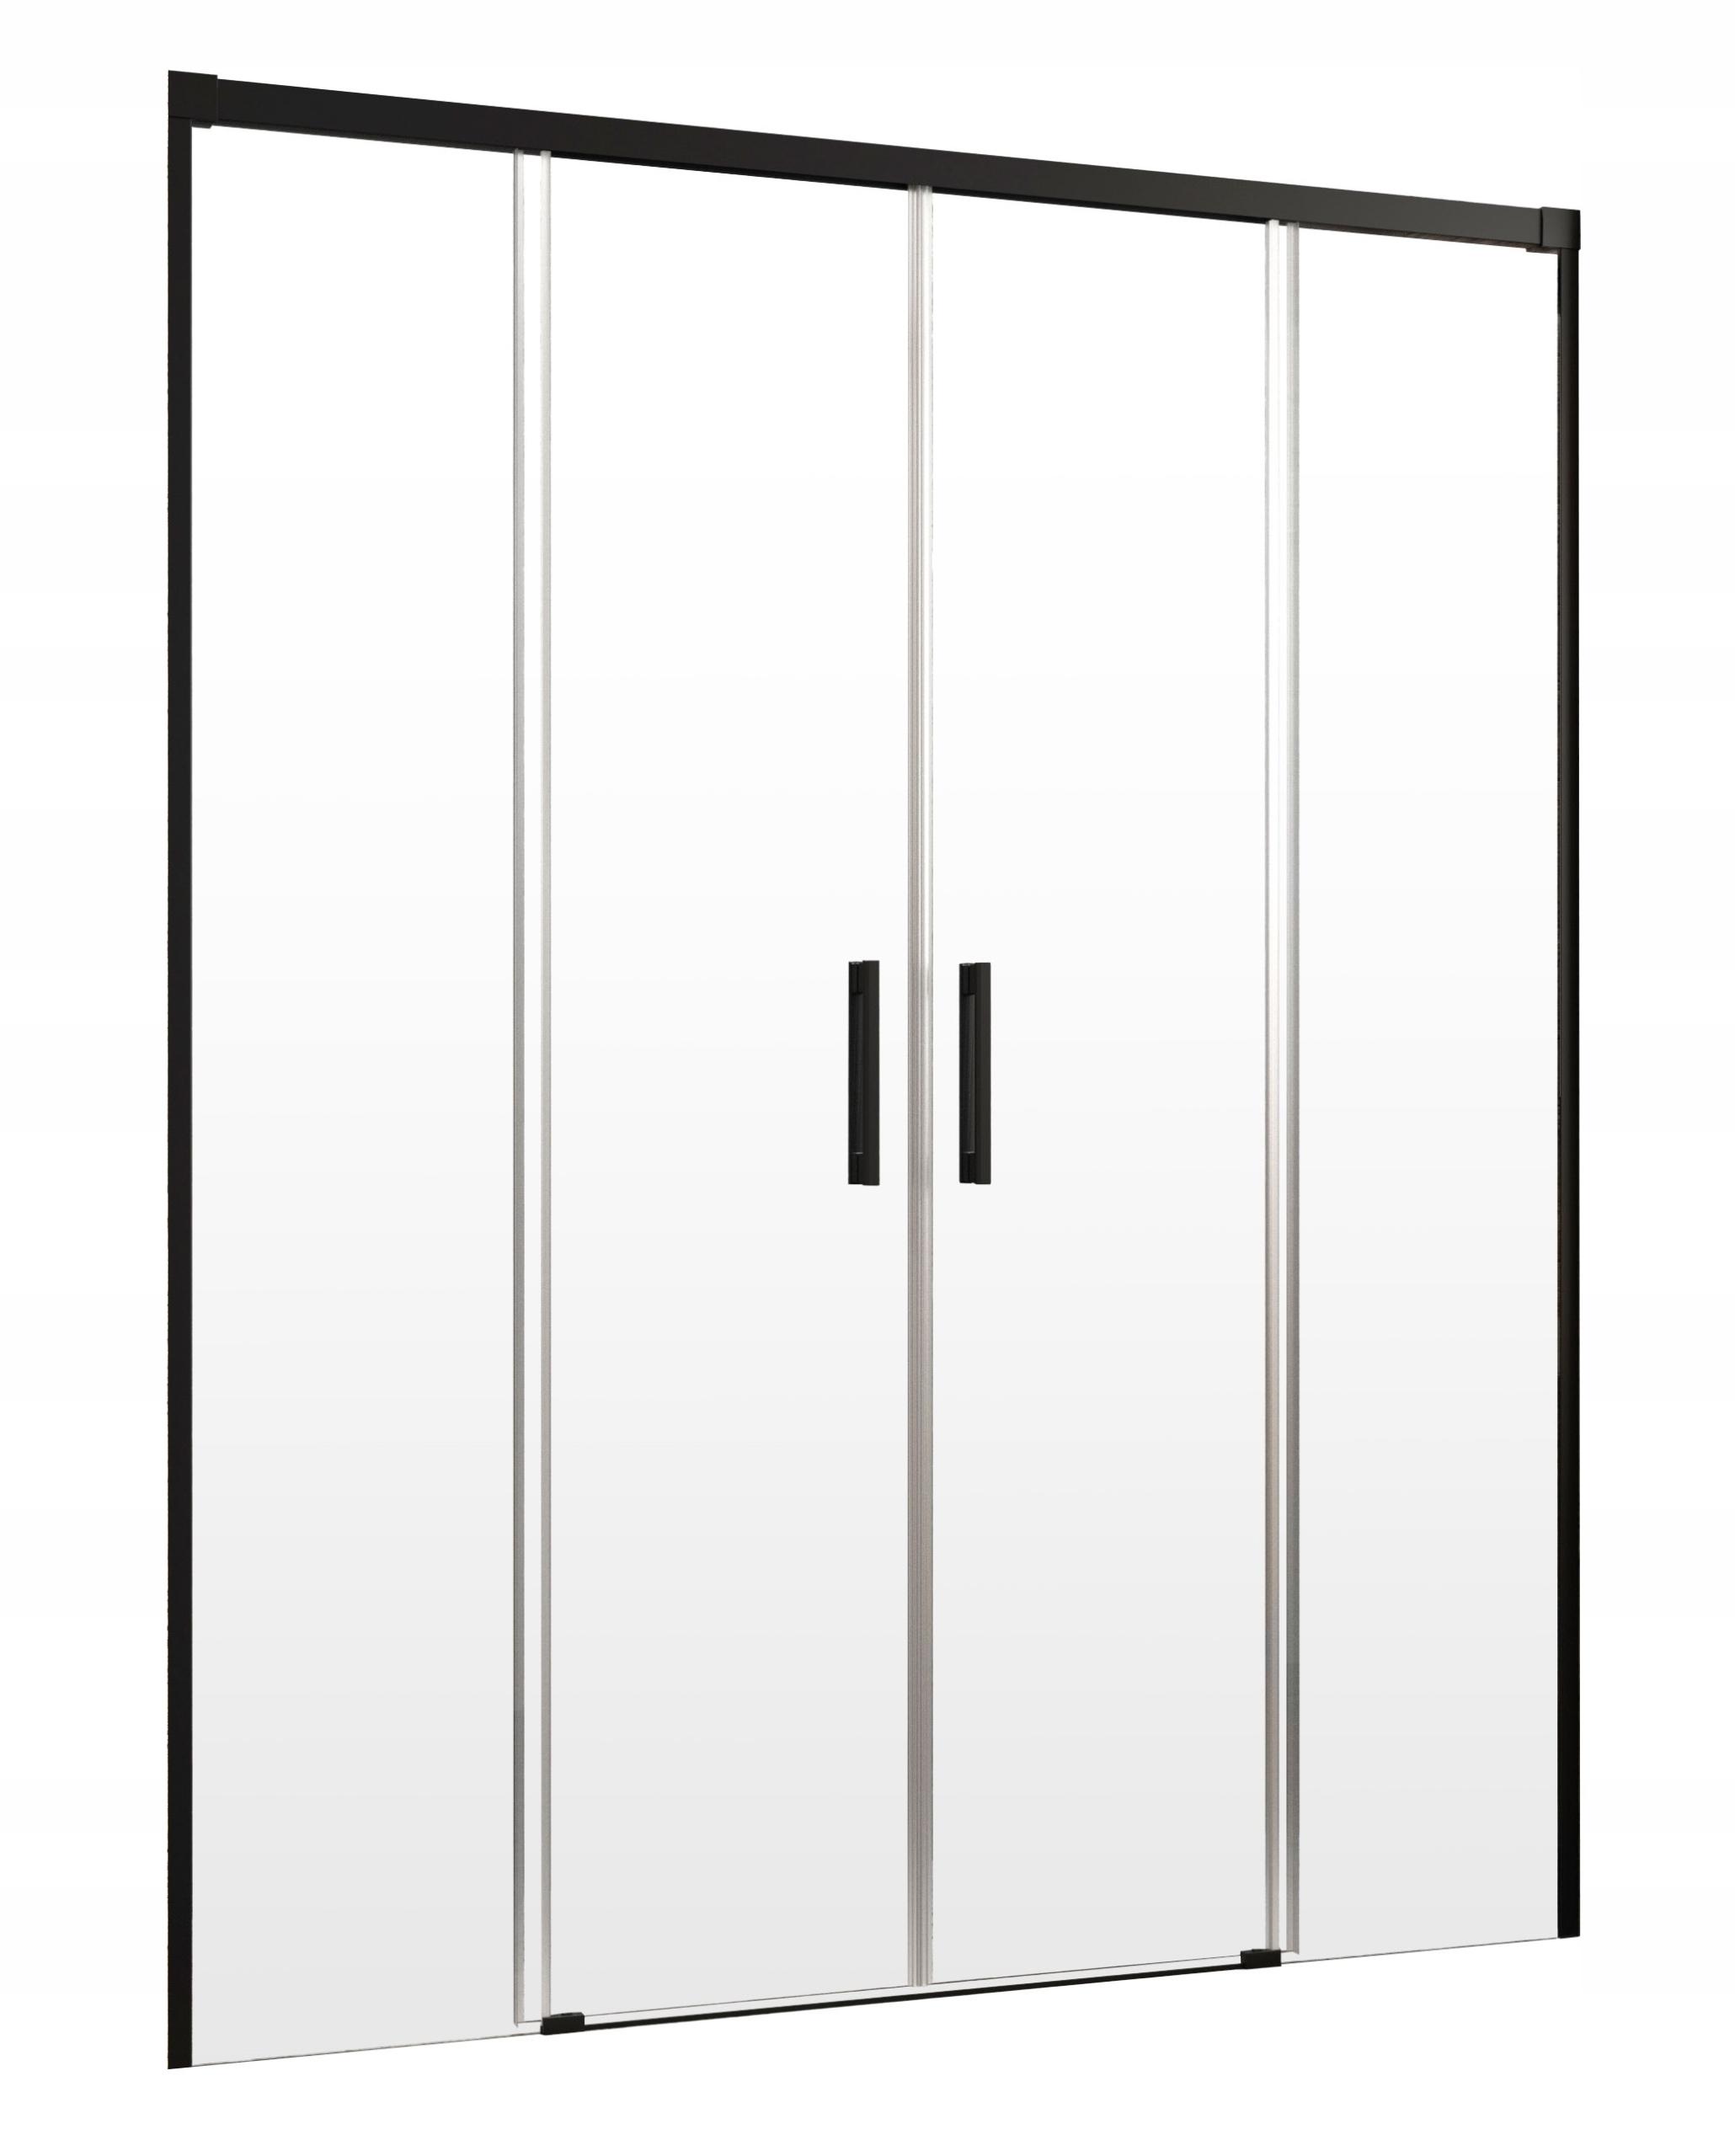 Idea Black DWD sprchové dvere RADAWAY 140x200,5